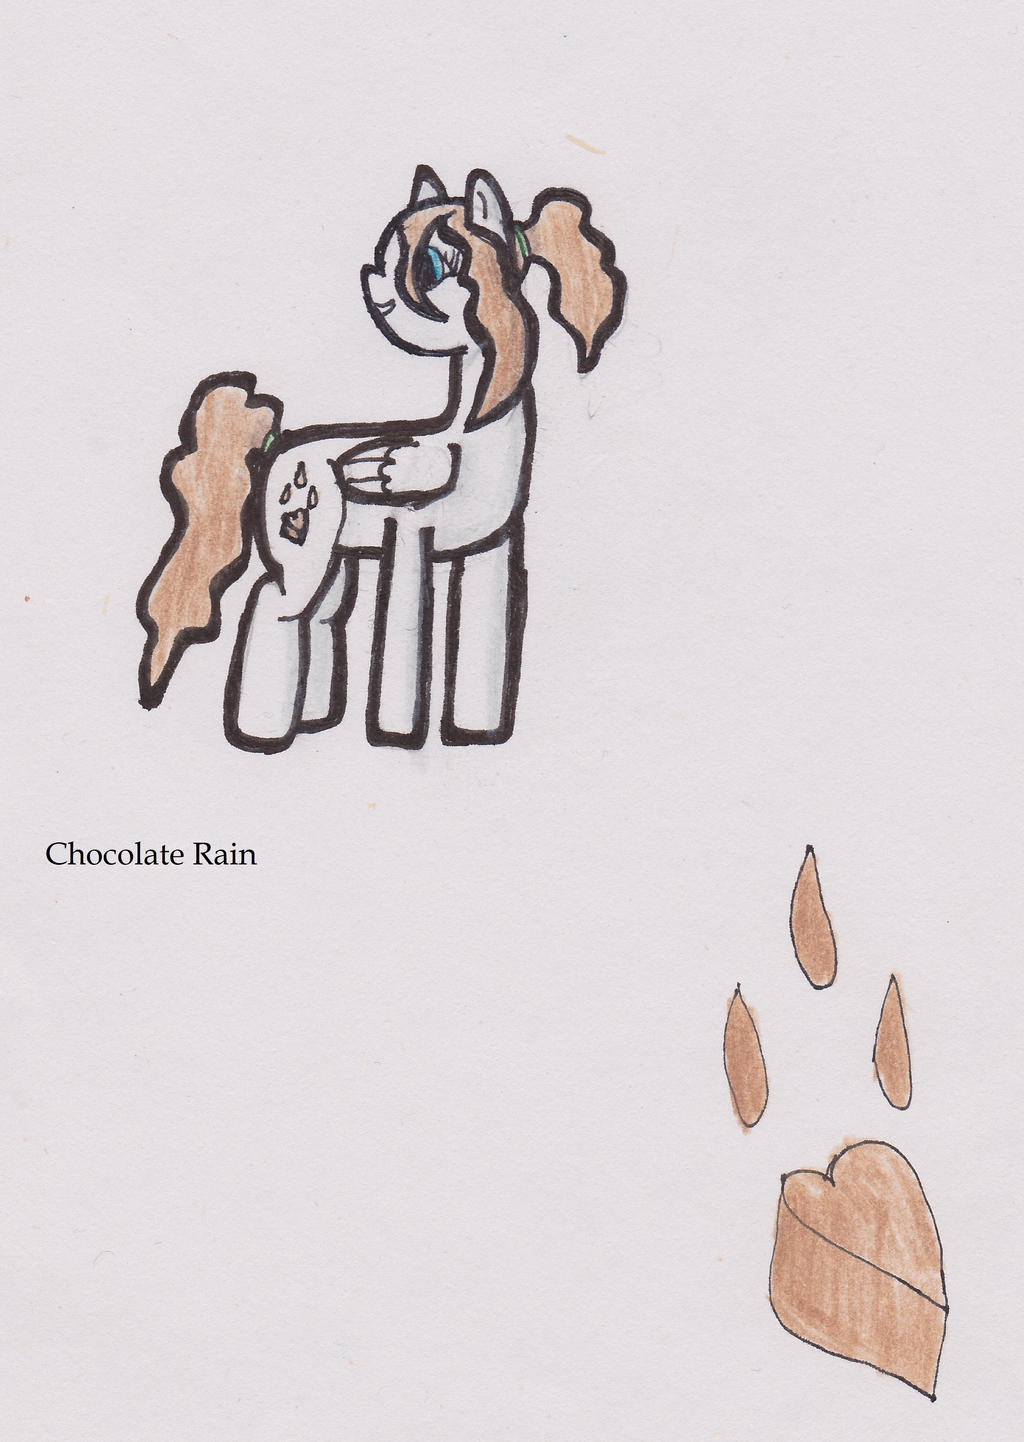 Chocolate Rain by Errand-Girl